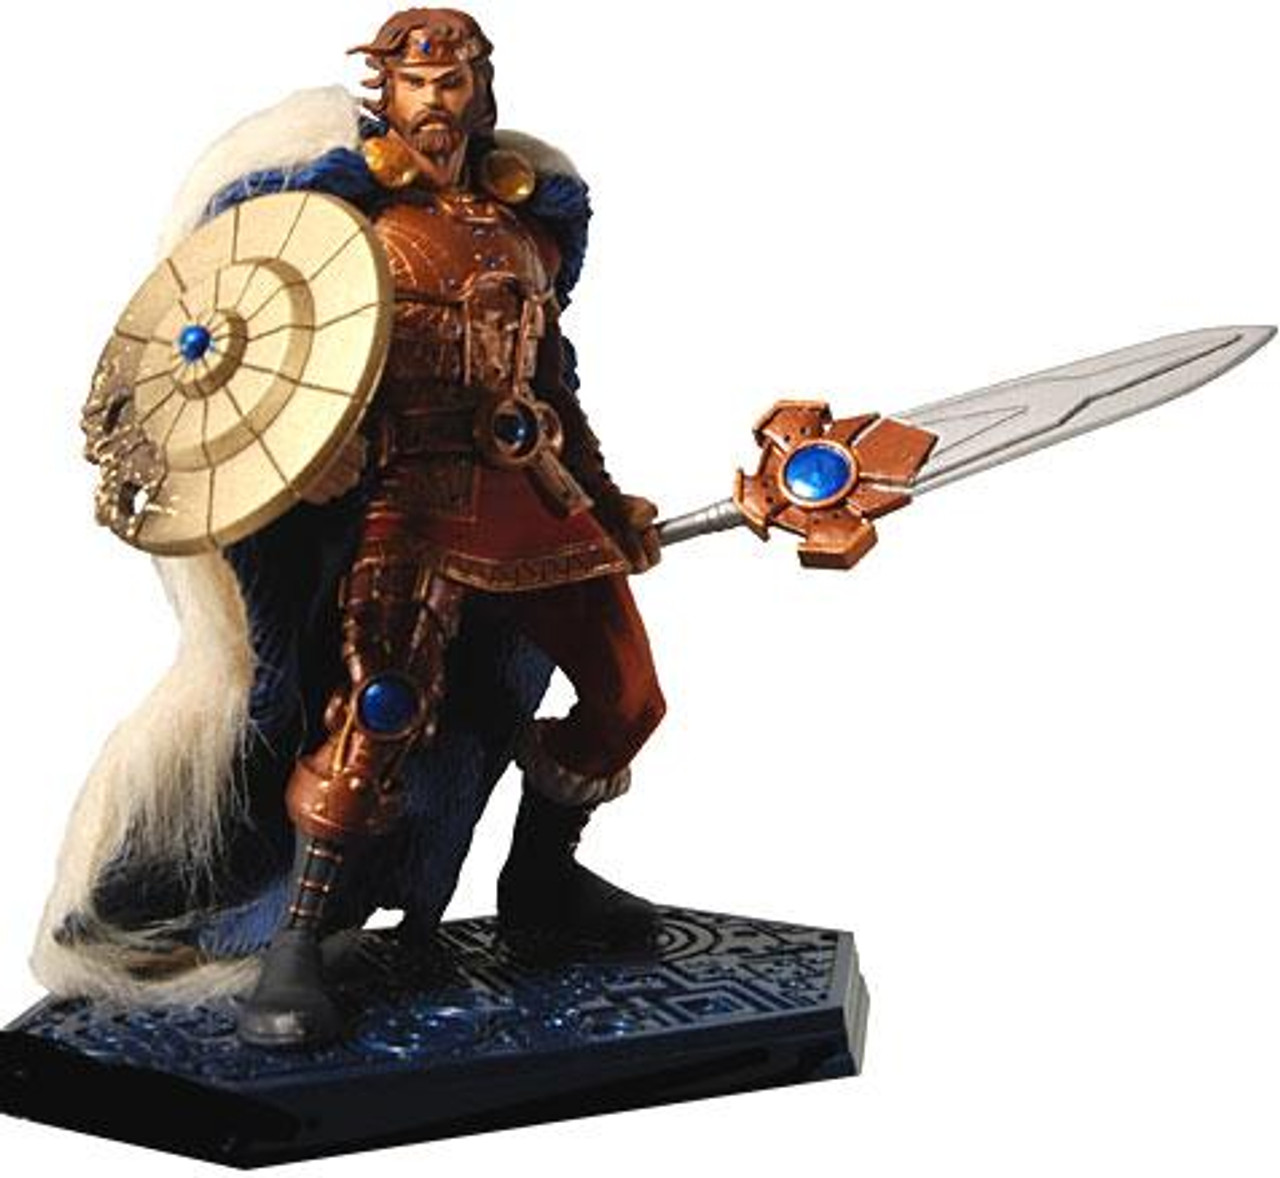 NECA Masters of the Universe King Randor Statue [Classic Colors]